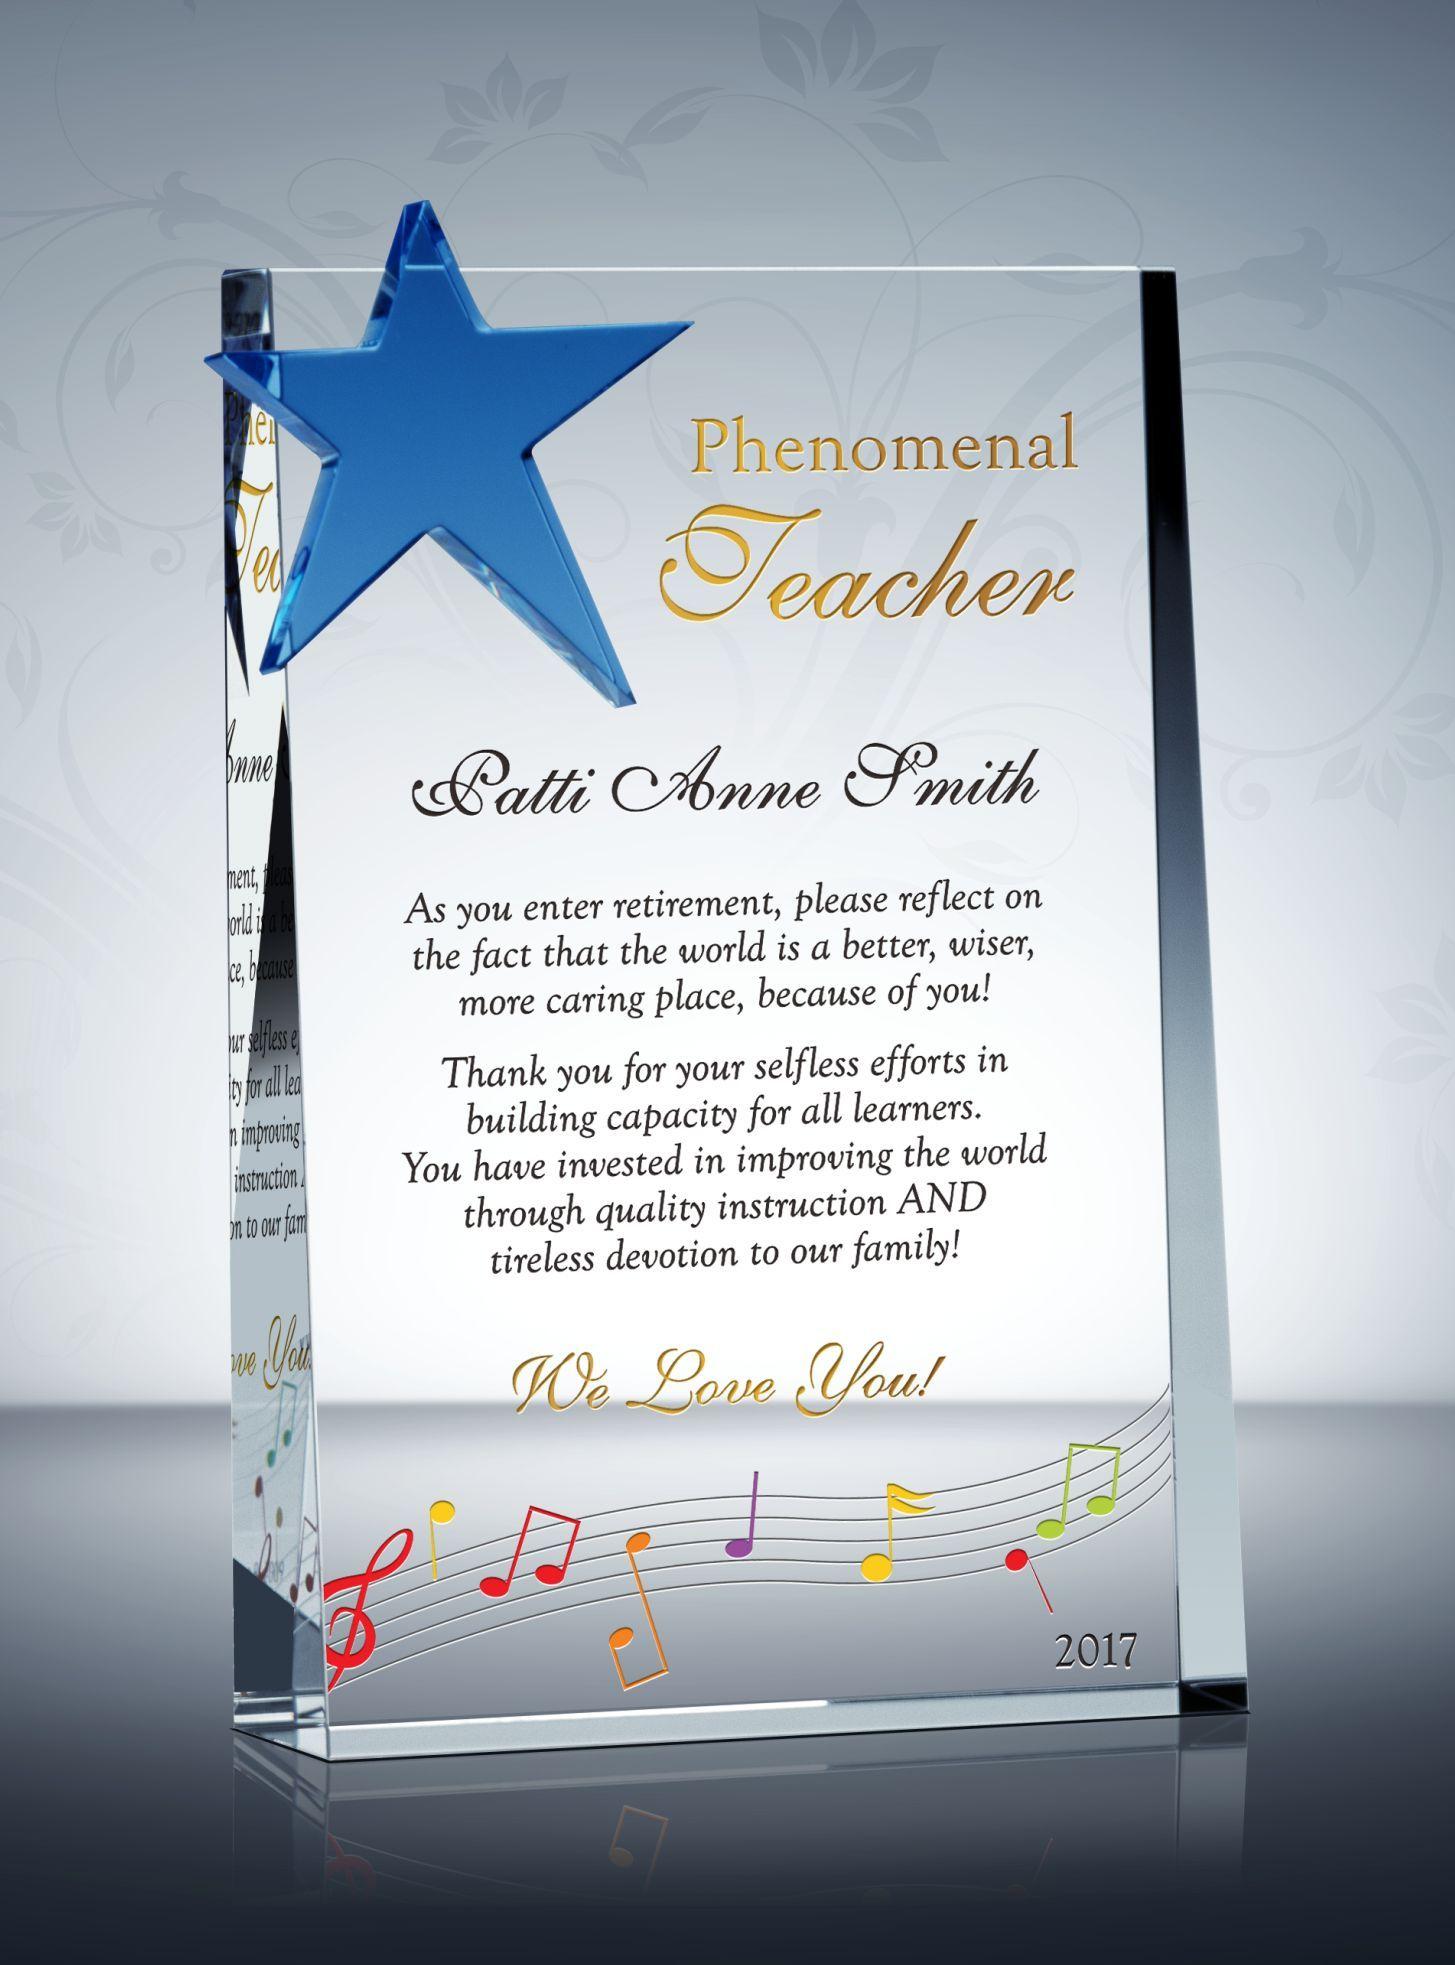 Music Teacher Retirement Choir Teacher Gift Band Teacher Throw Personalized School Throw Musician Personalized Gift Music Teacher Gift